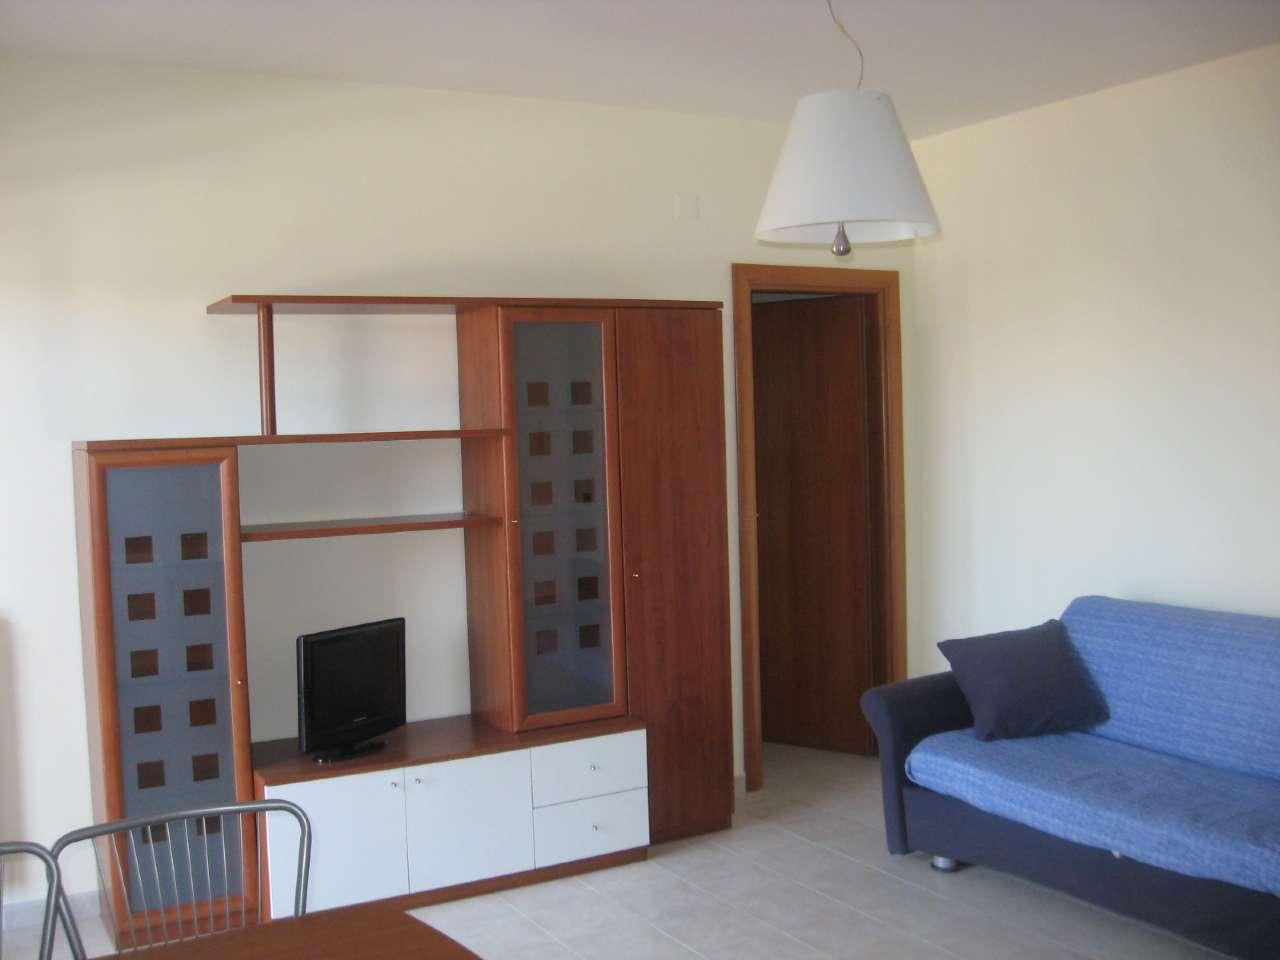 appartamenti in affitto a caserta